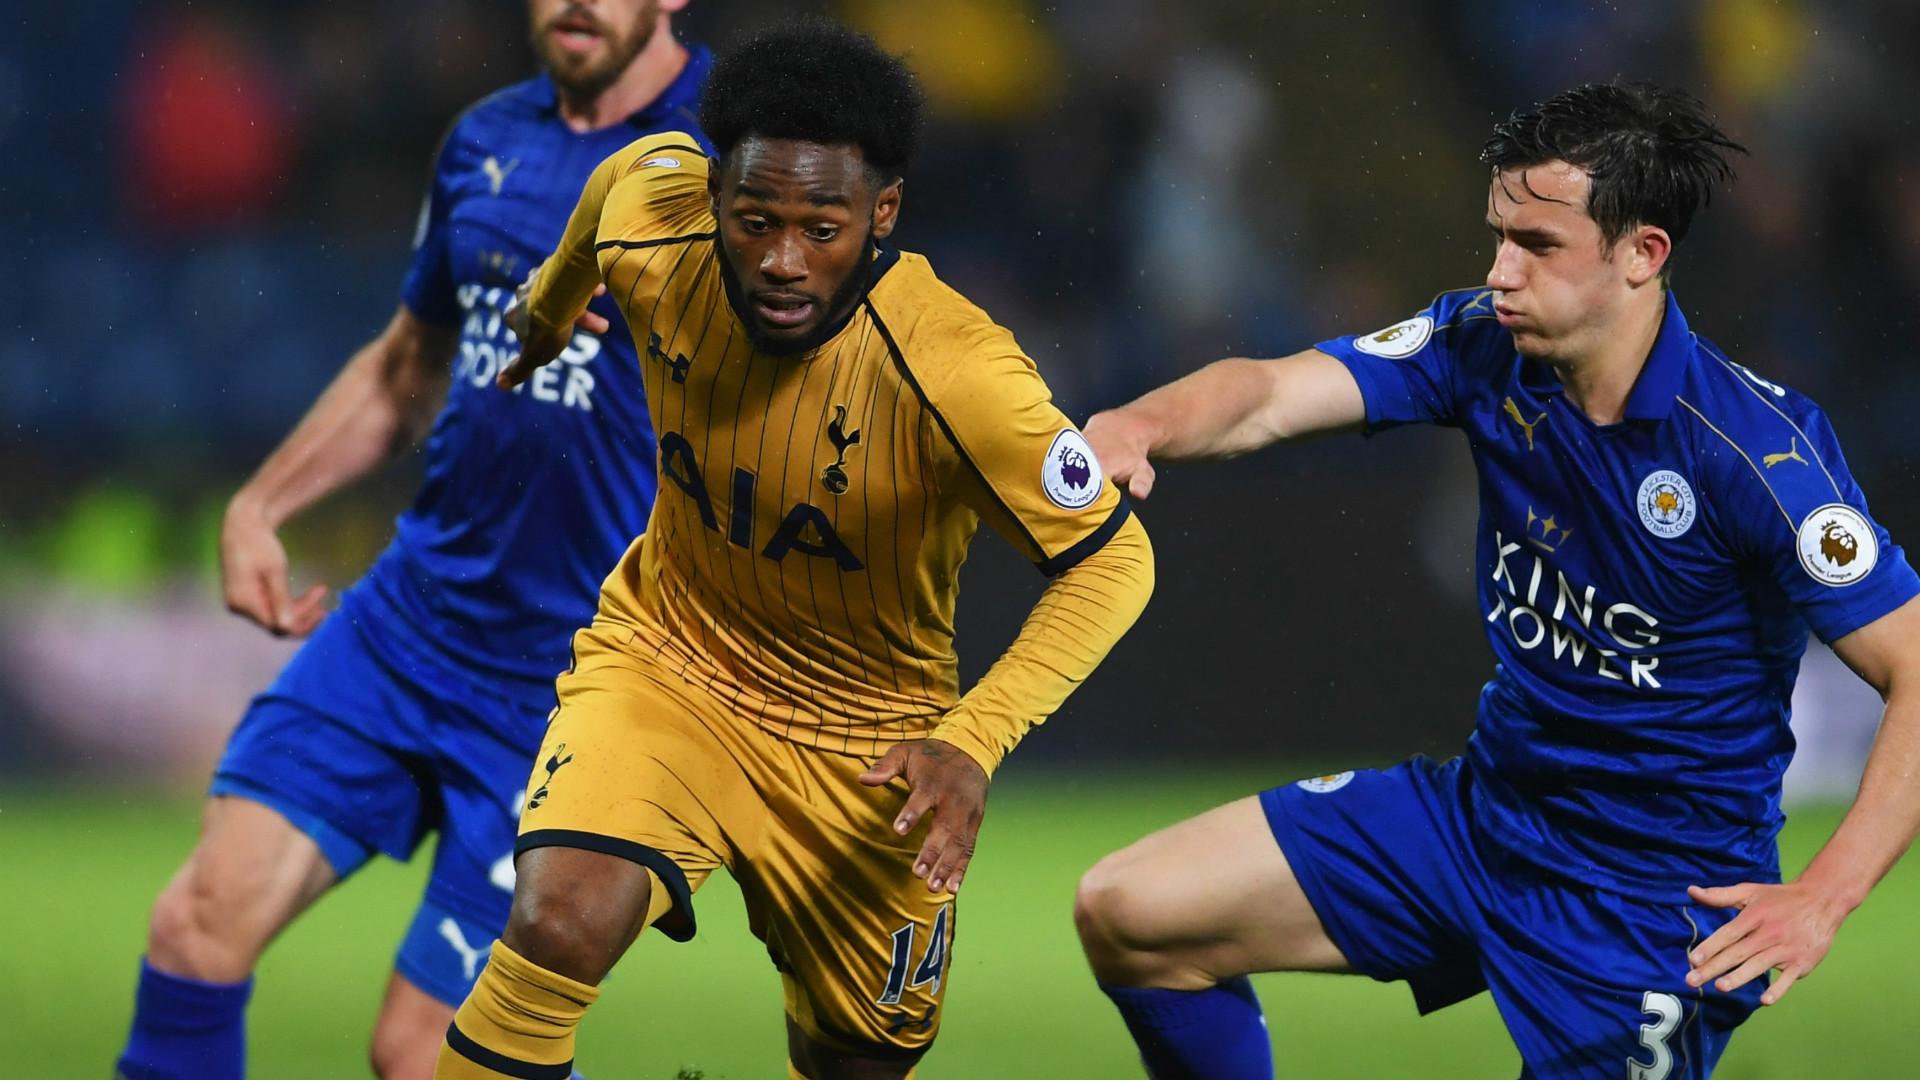 Georges-Kevin Nkoudou Tottenham